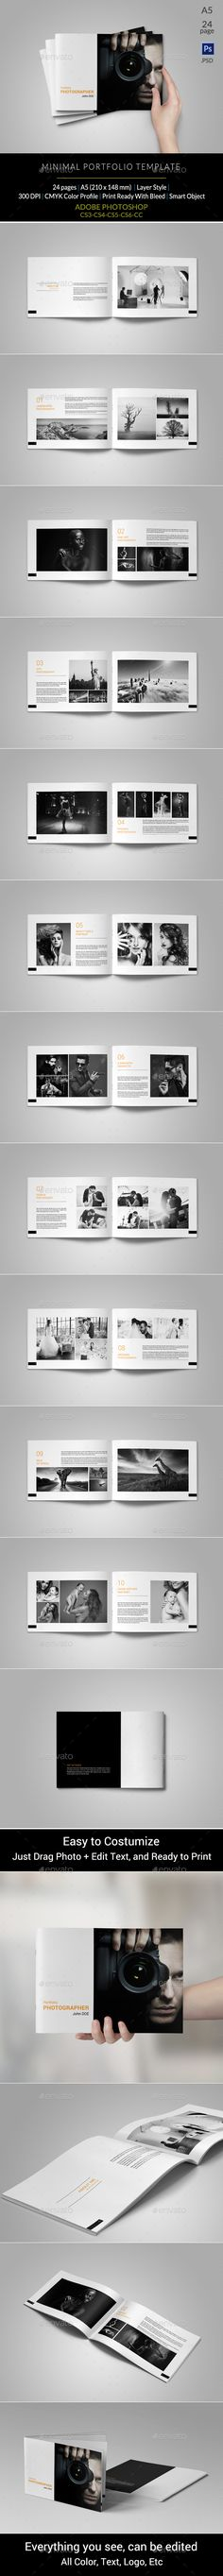 Portfolio Photographer Brochure Template PSD #design Download: http://graphicriver.net/item/portfolio-photographer/13628798?ref=ksioks